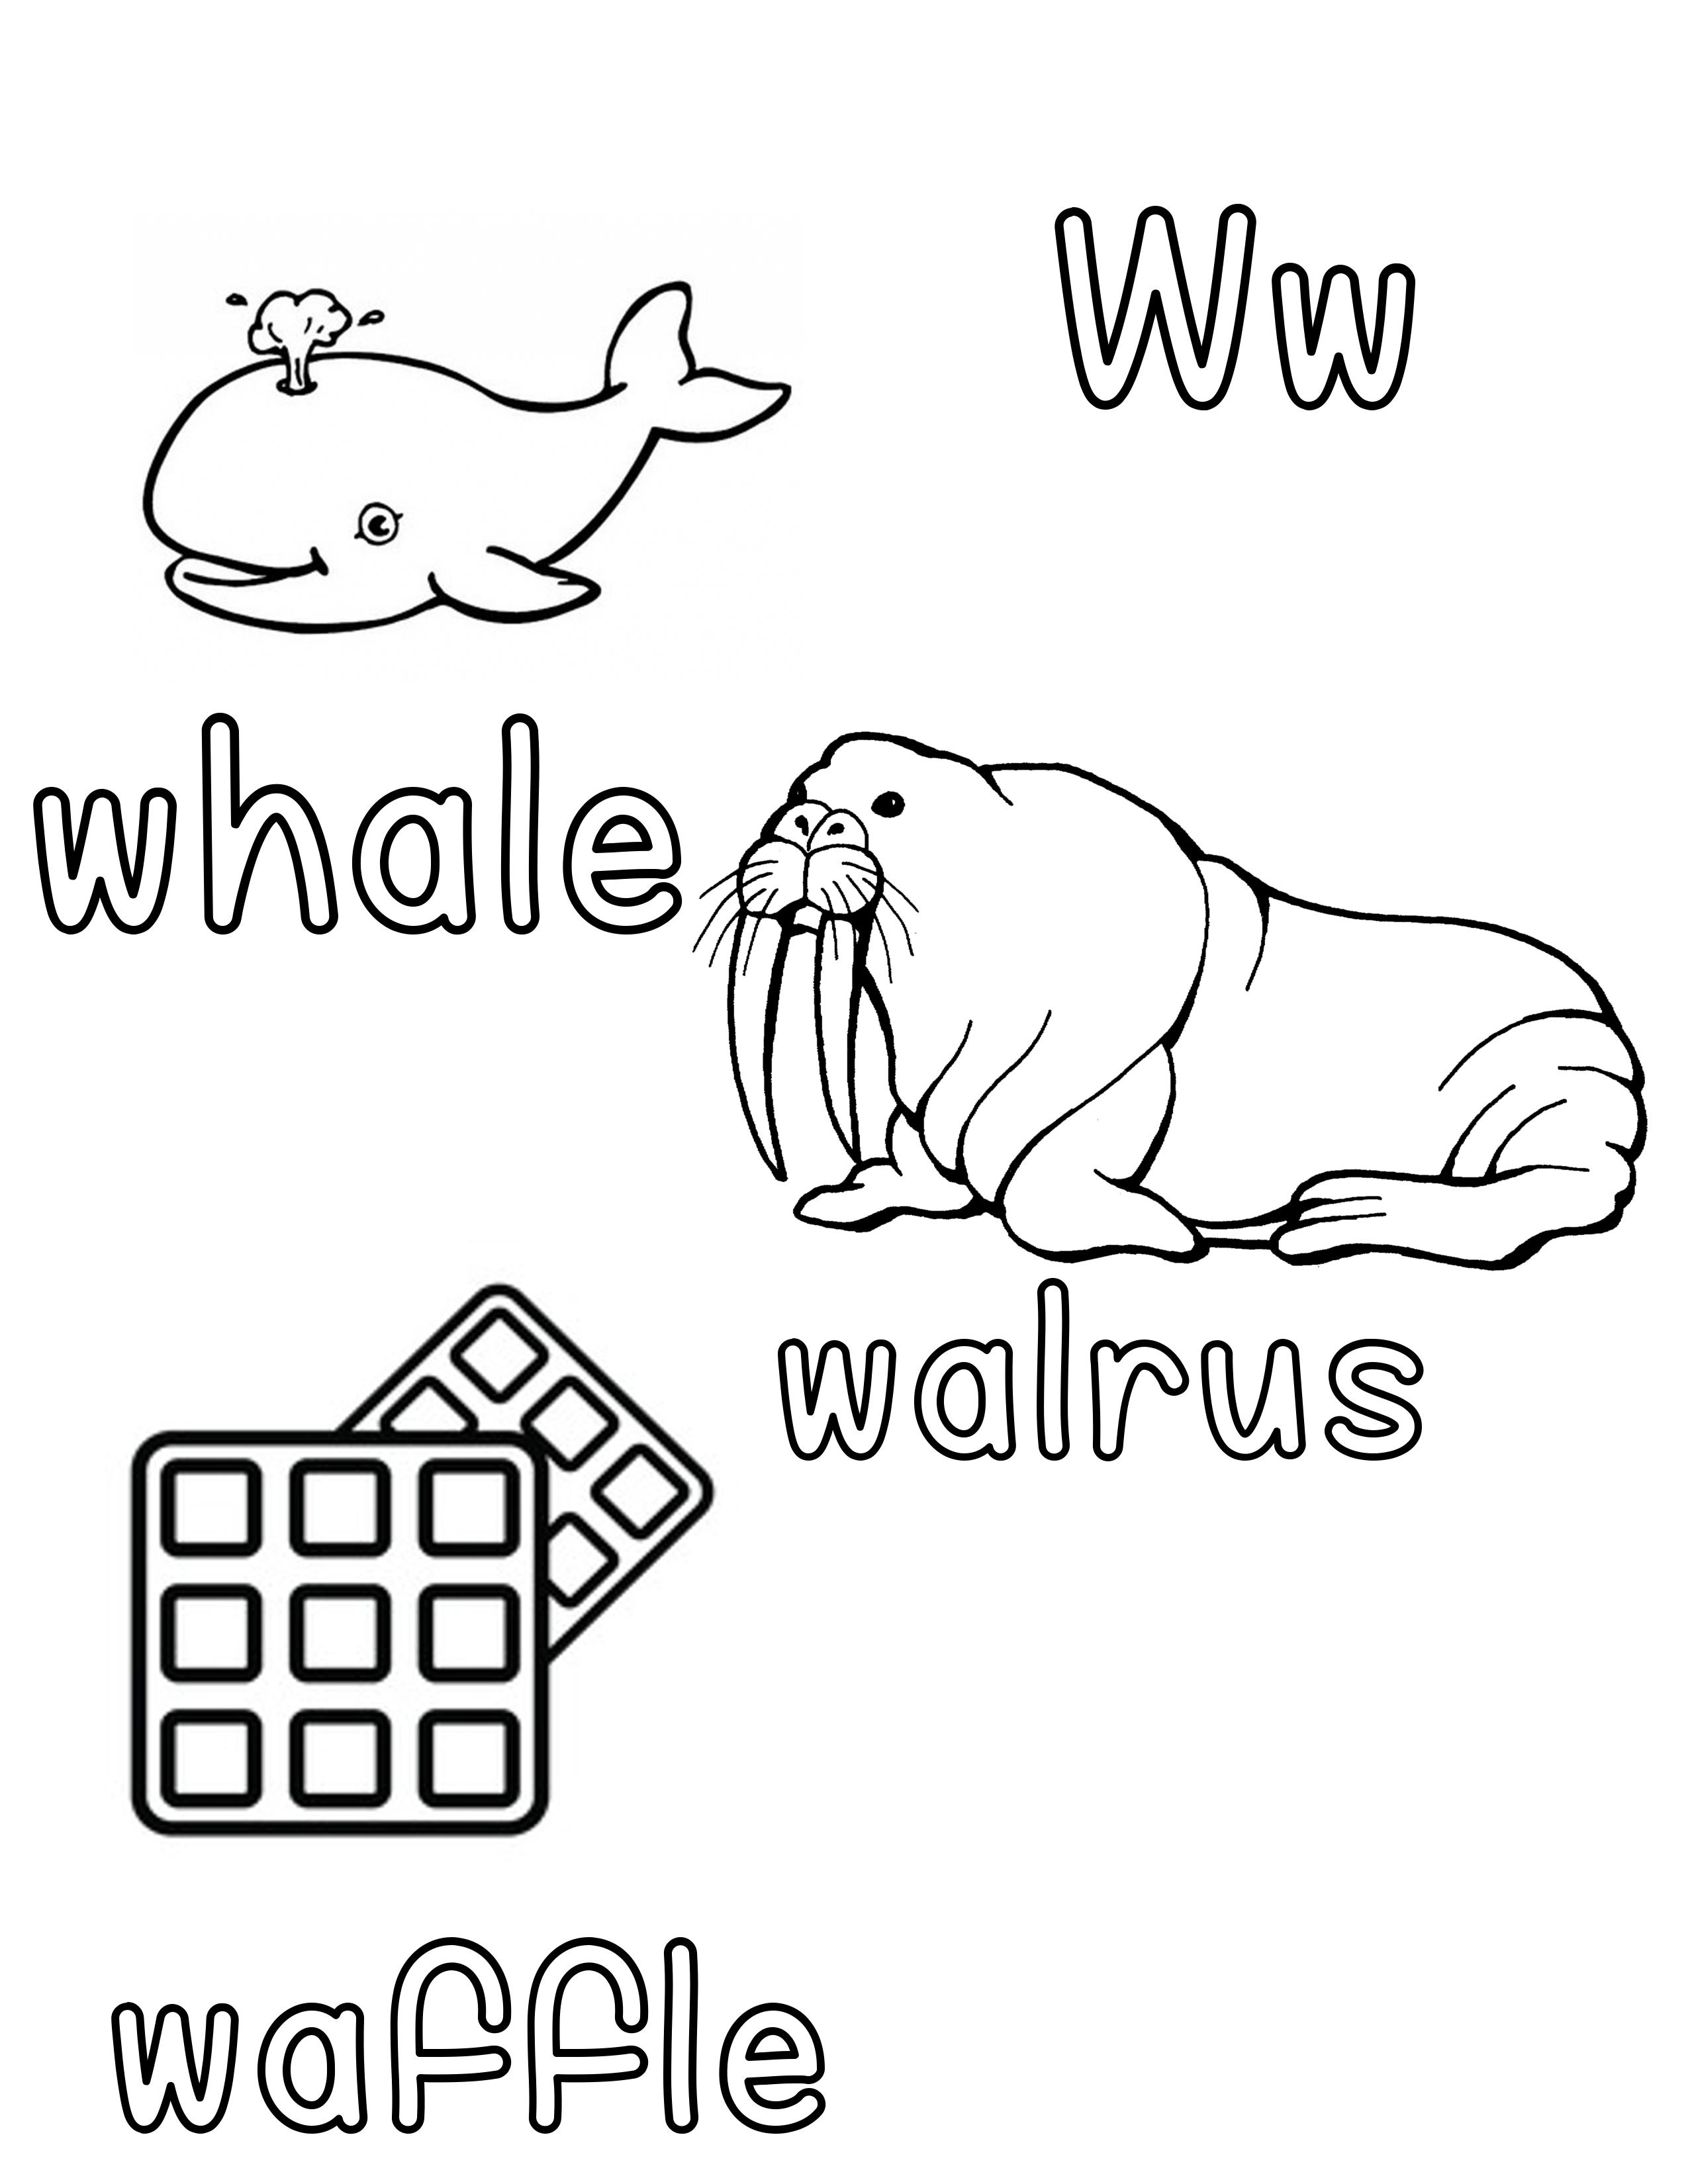 Phonetic Ww Coloring Sheet